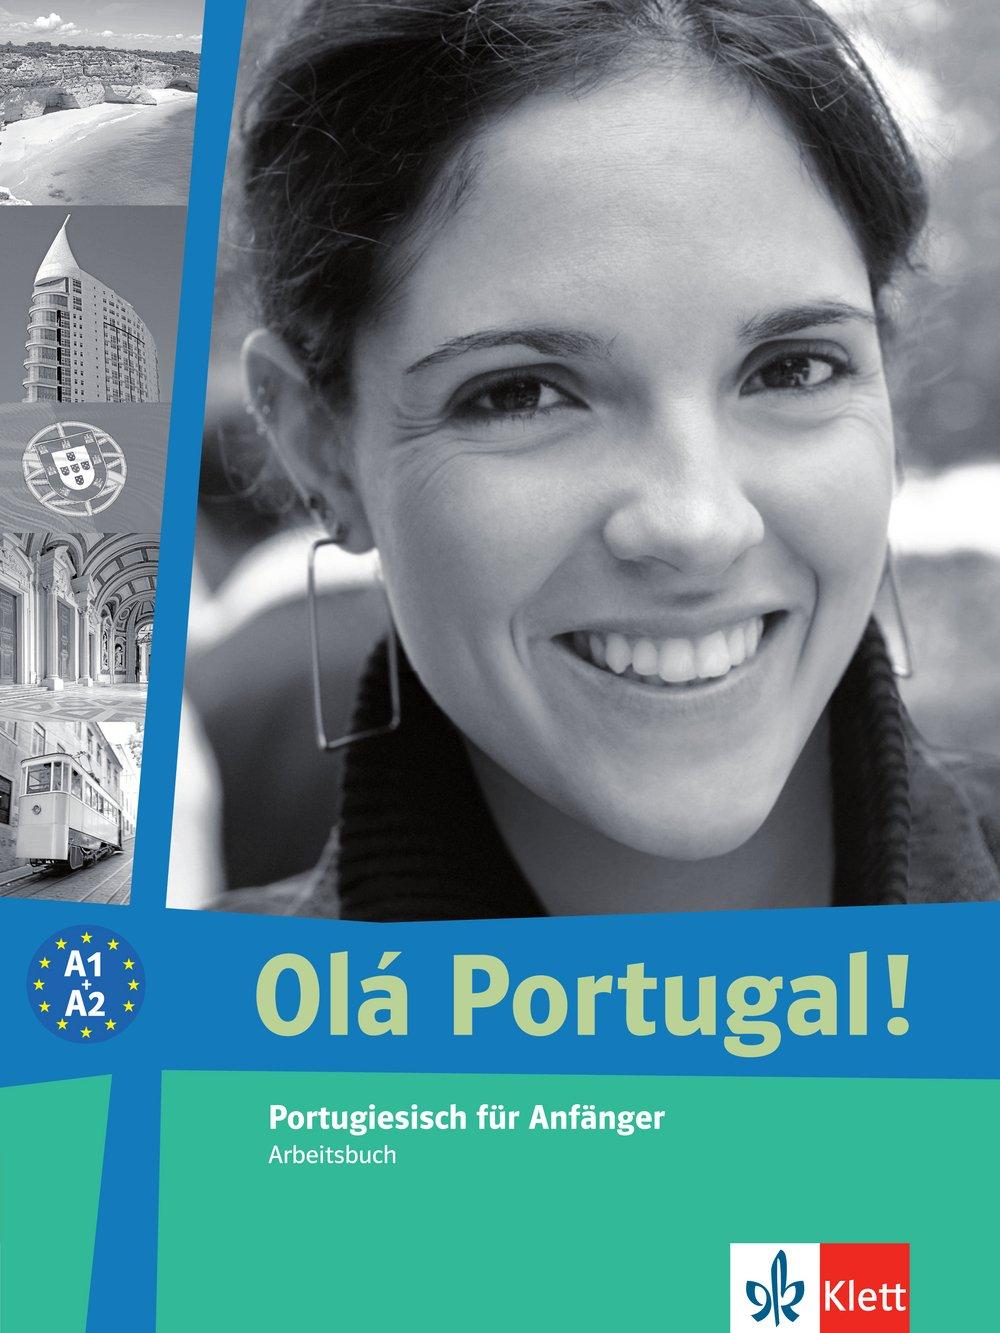 Olá Portugal! A1-A2: Portugiesisch für Anfänger. Arbeitsbuch (Olá Portugal! neu)